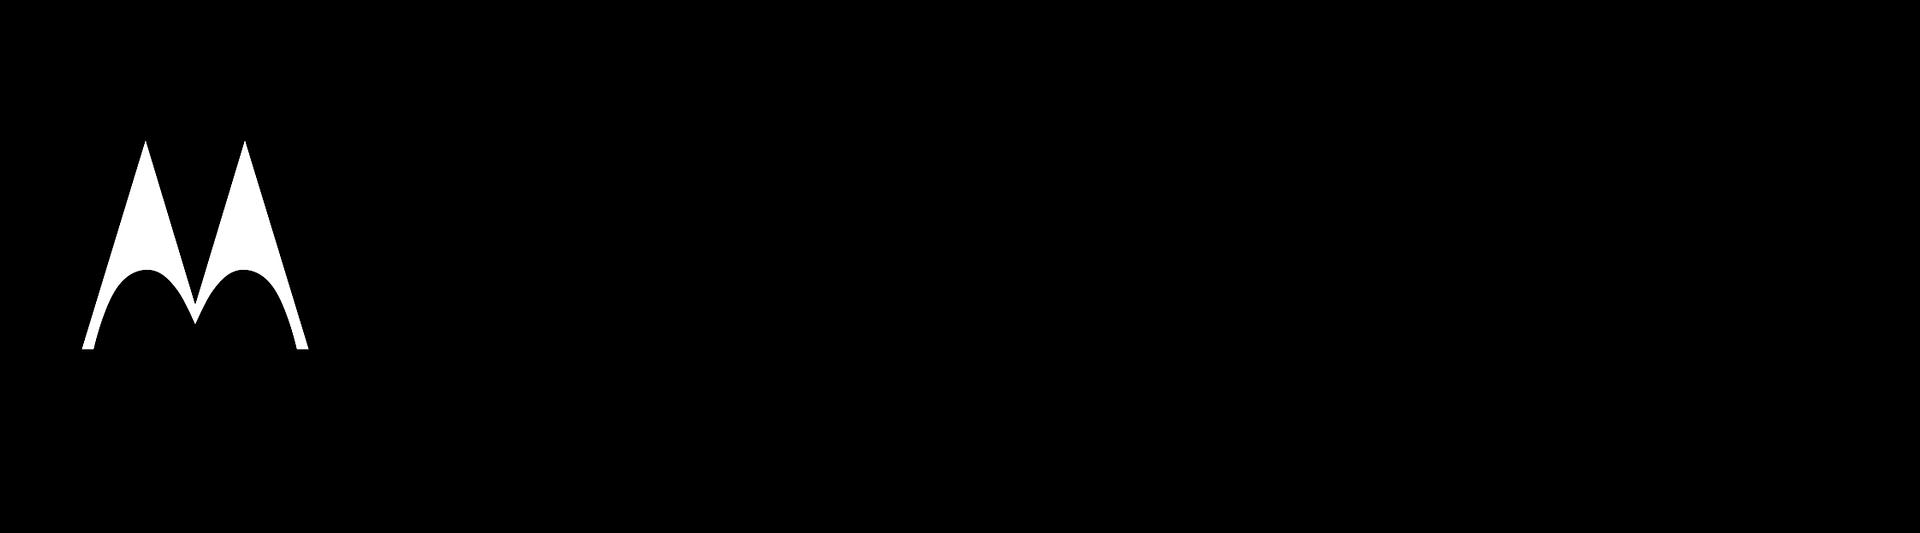 Motorola-logo-black-and-white copy